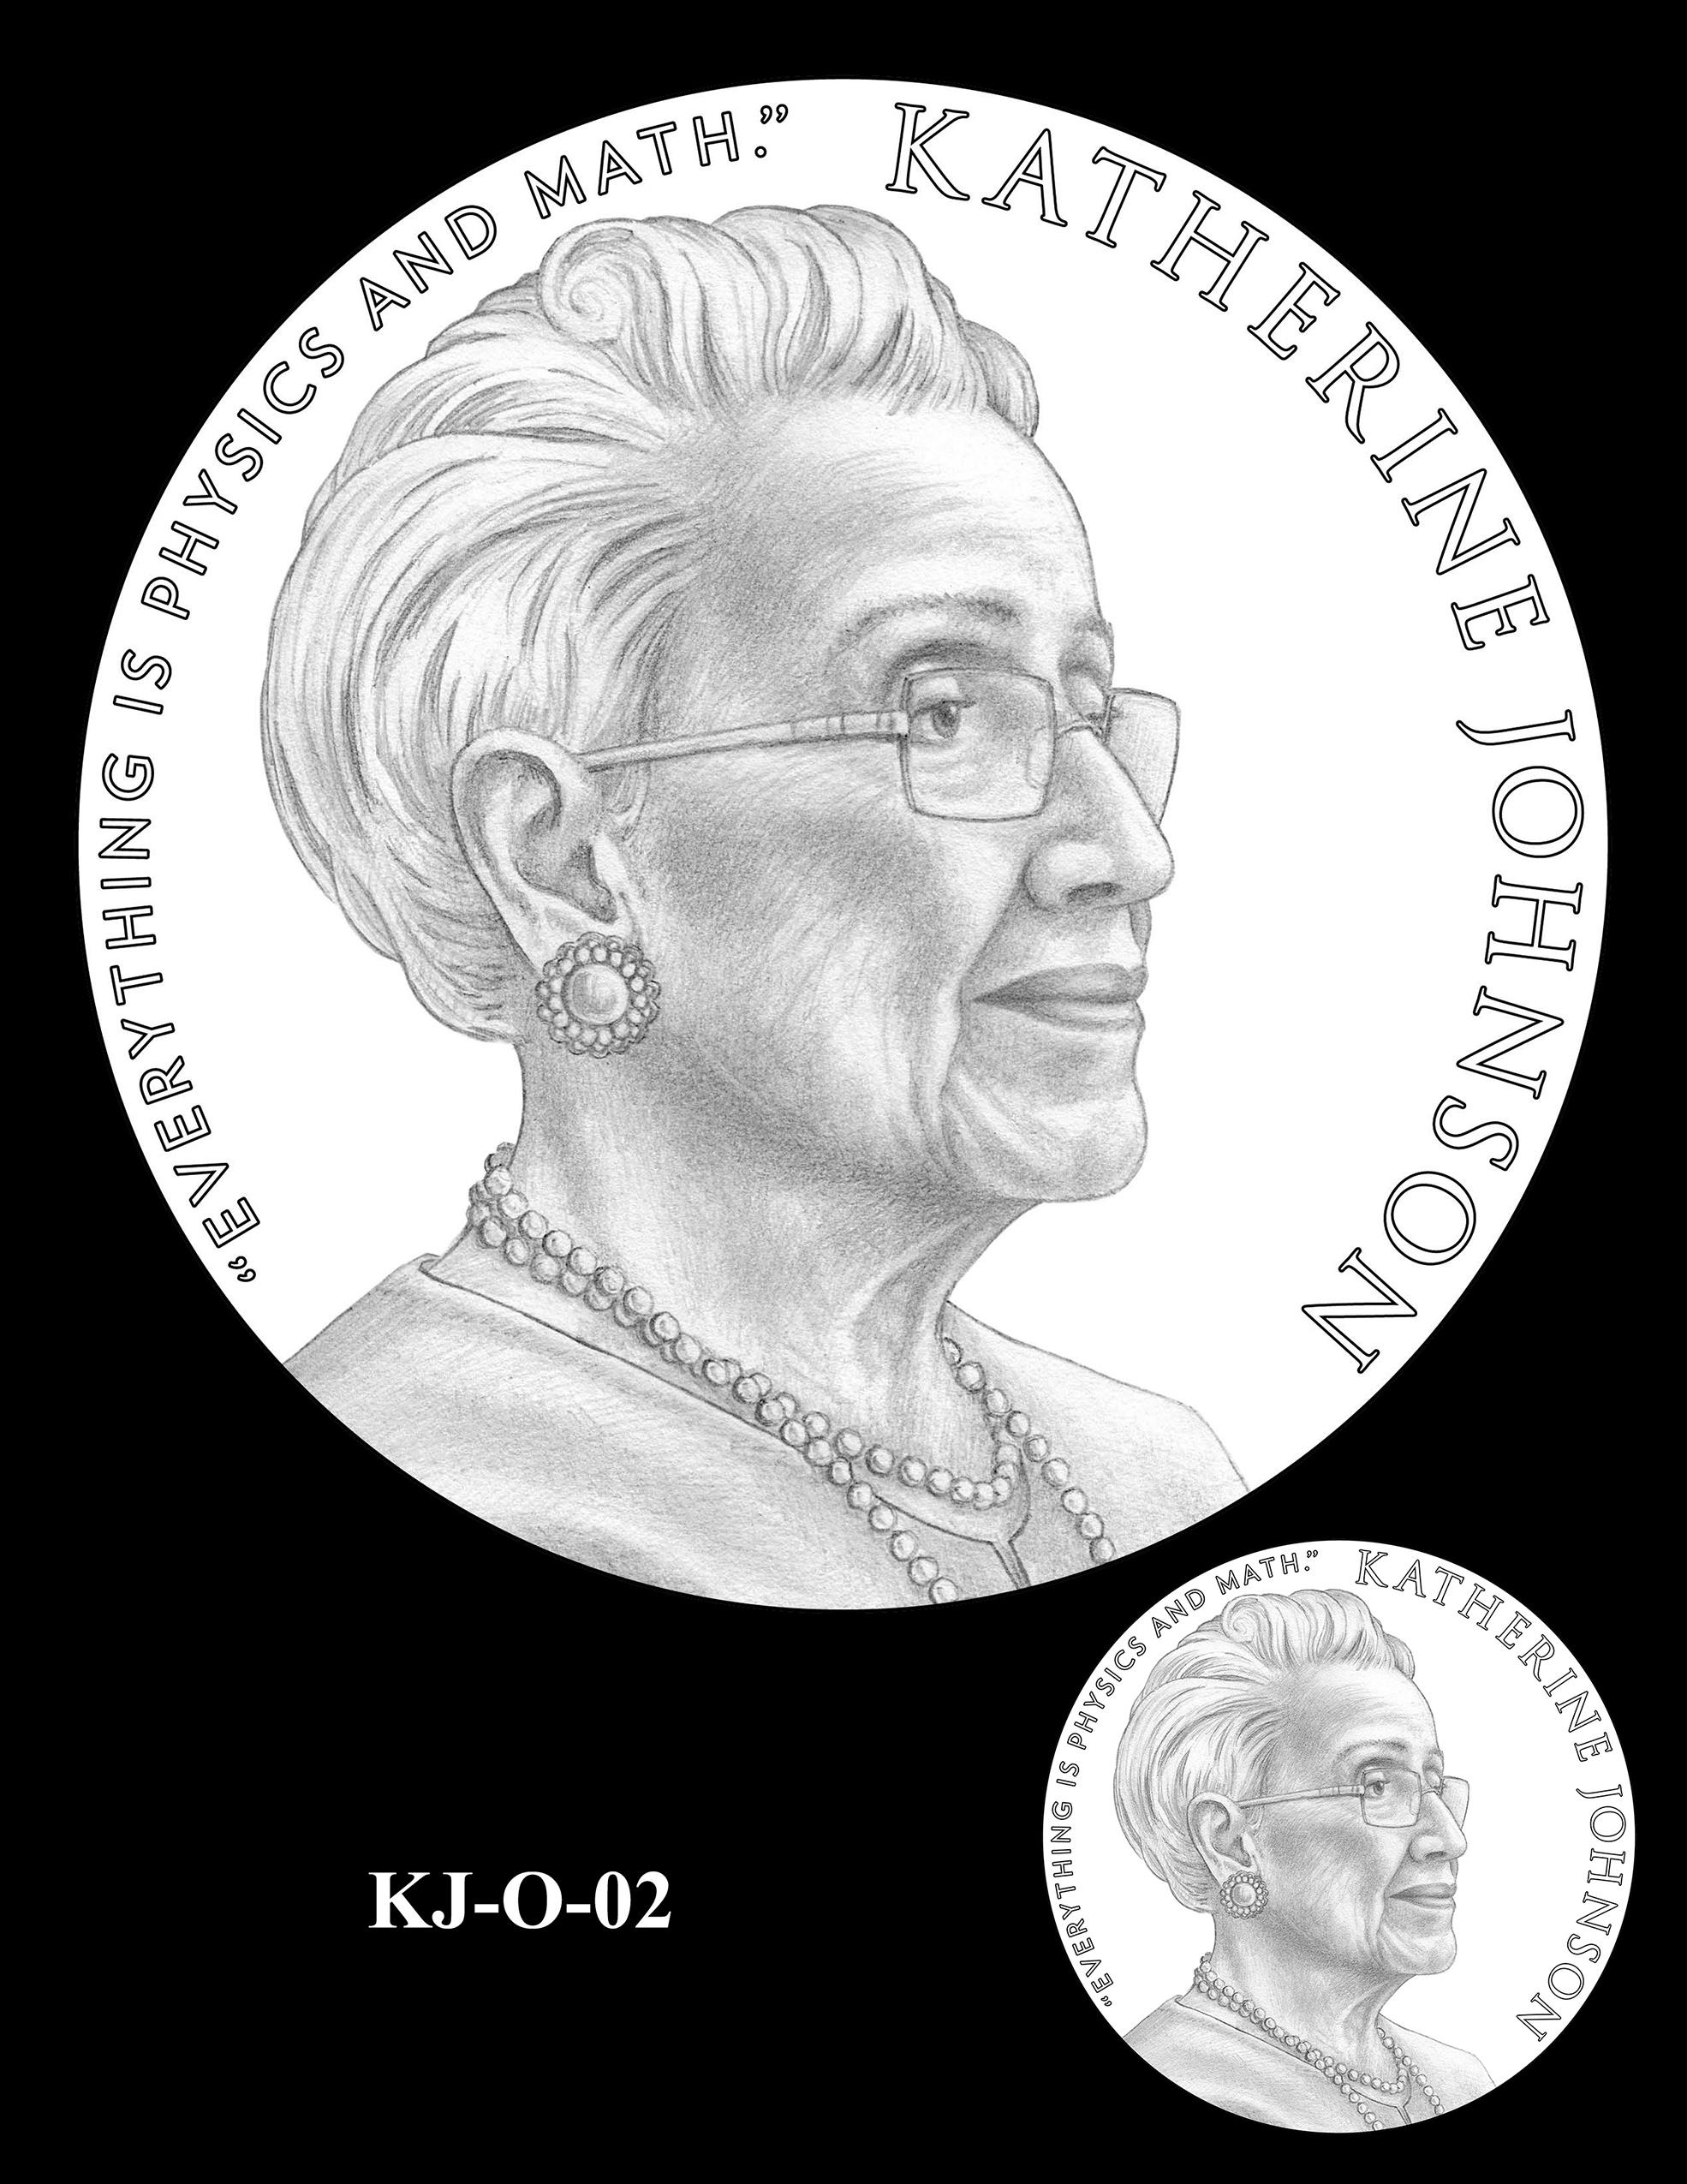 KJ-O-02 -- Katherine Johnson Congressional Gold Medal